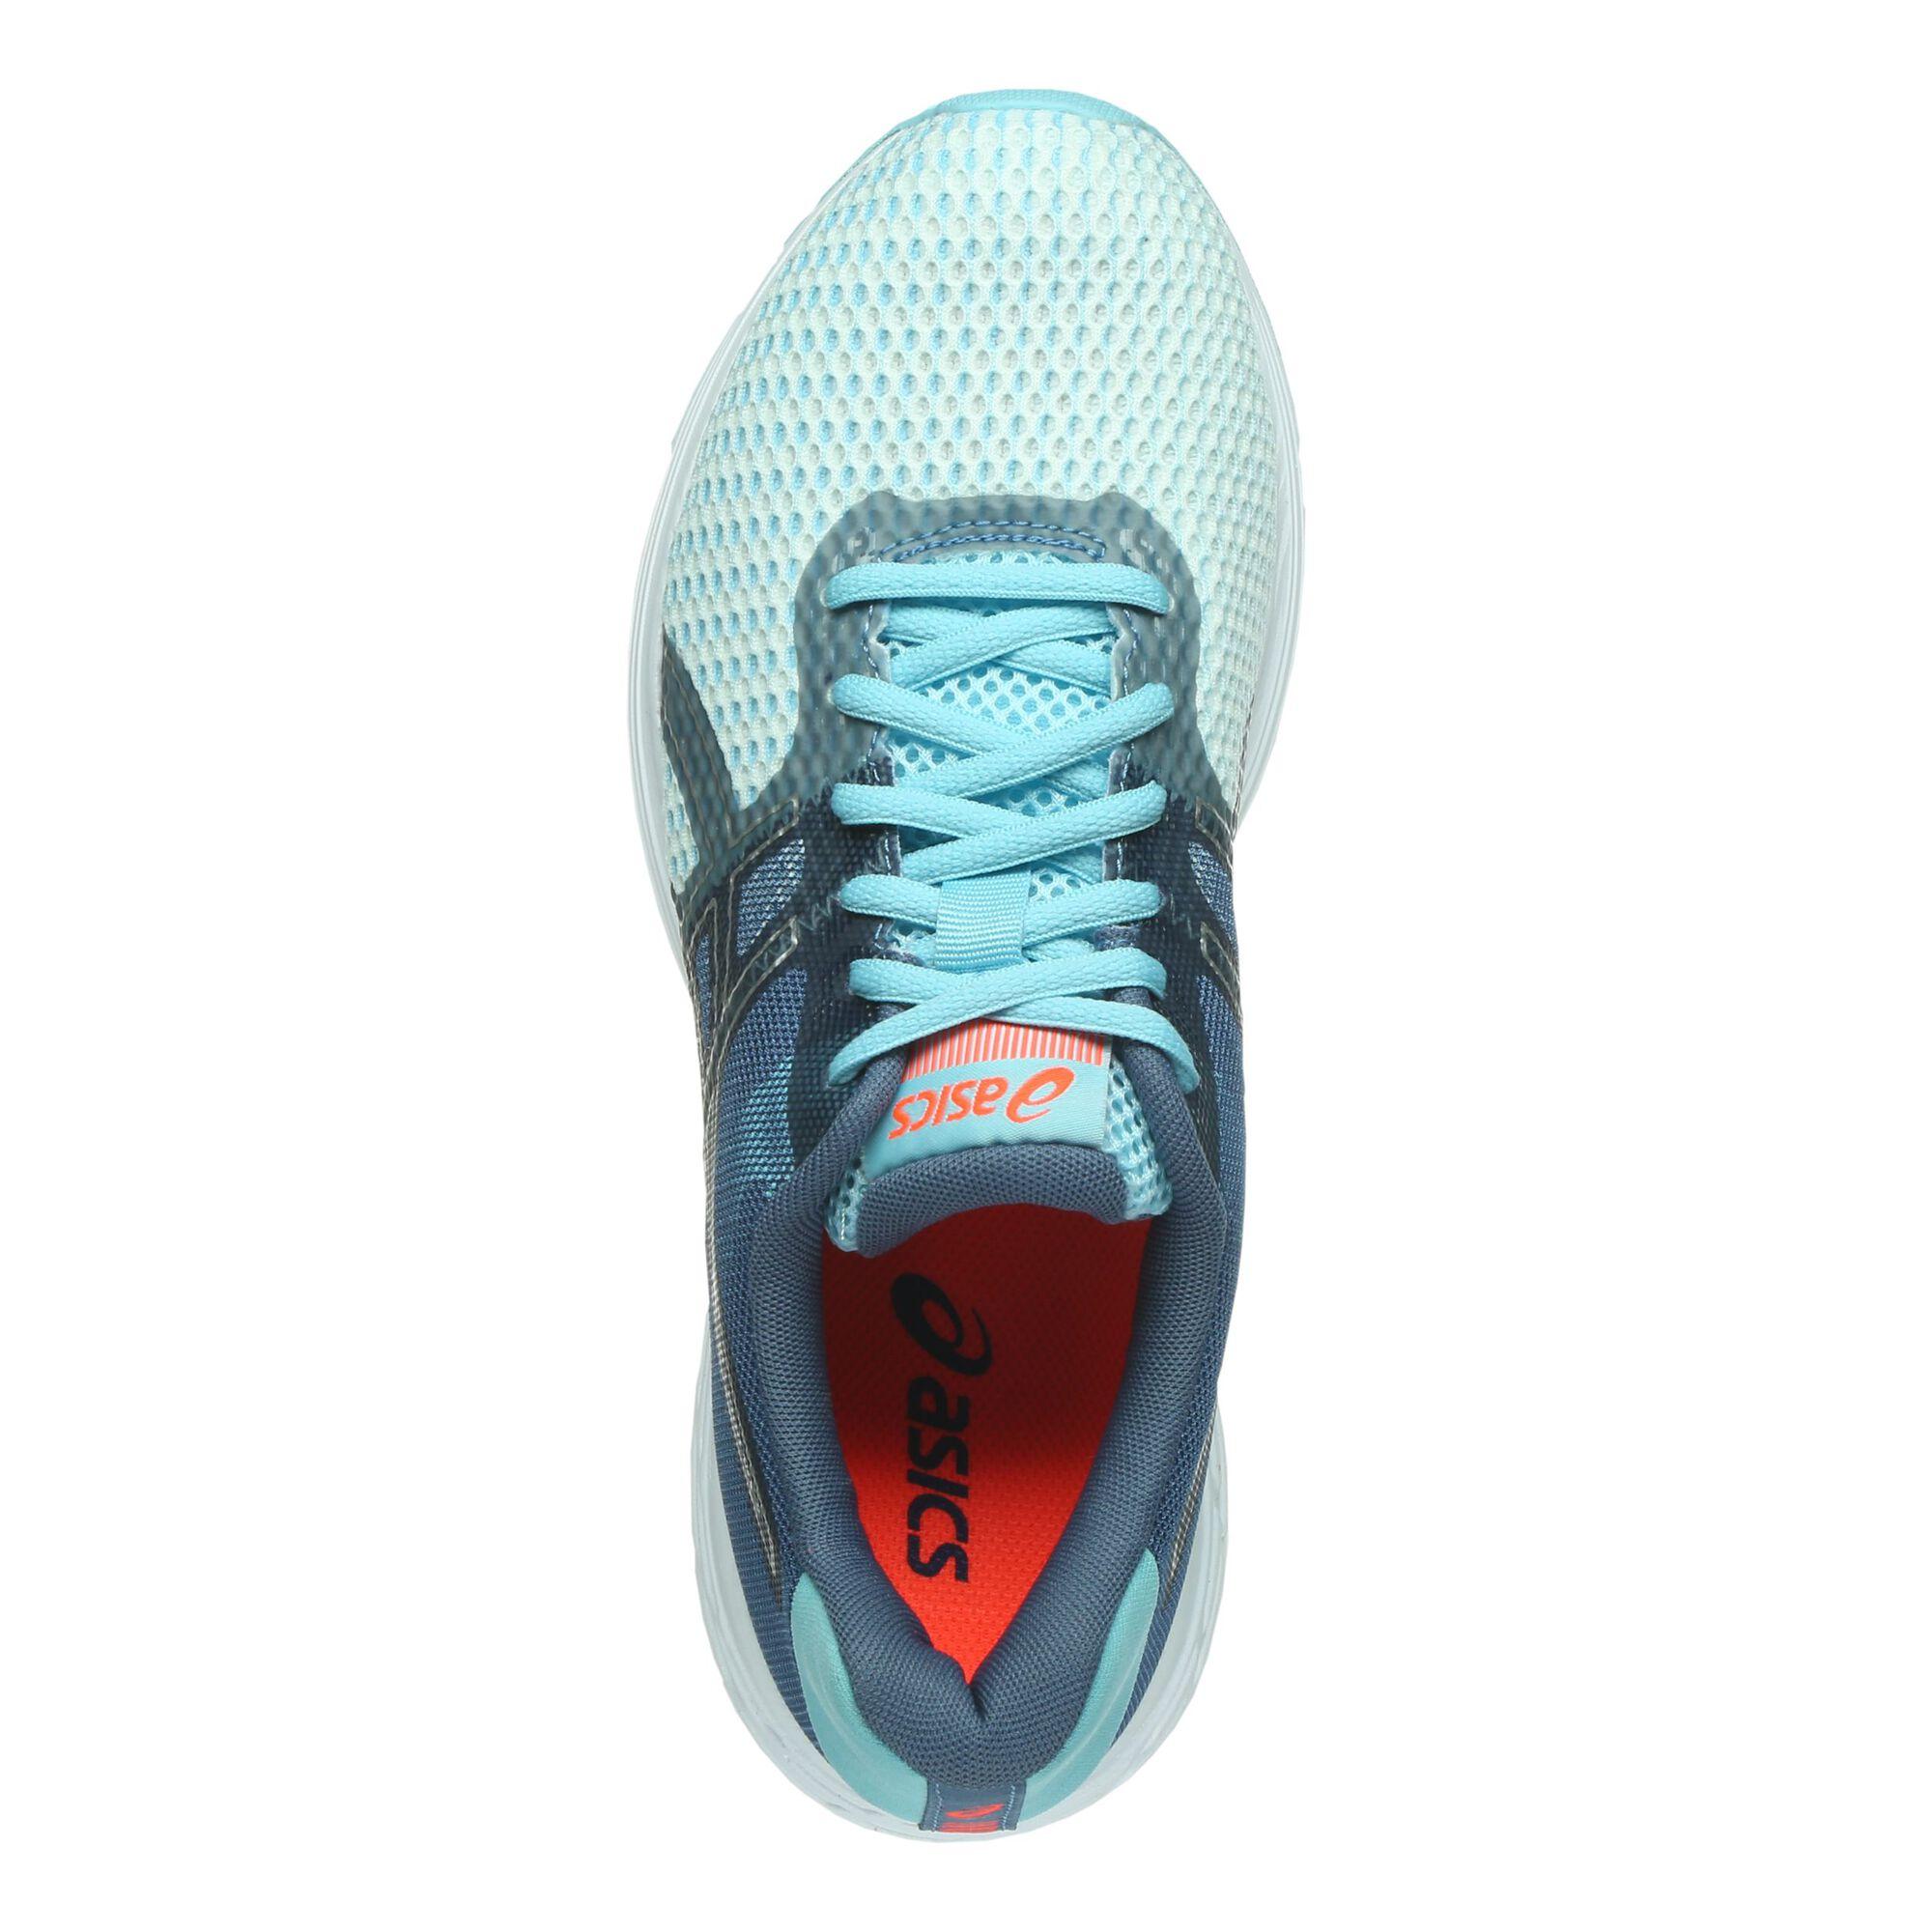 b49ff63456 buy Asics Gel-Phoenix 9 Stability Running Shoe Women - Dark Blue ...